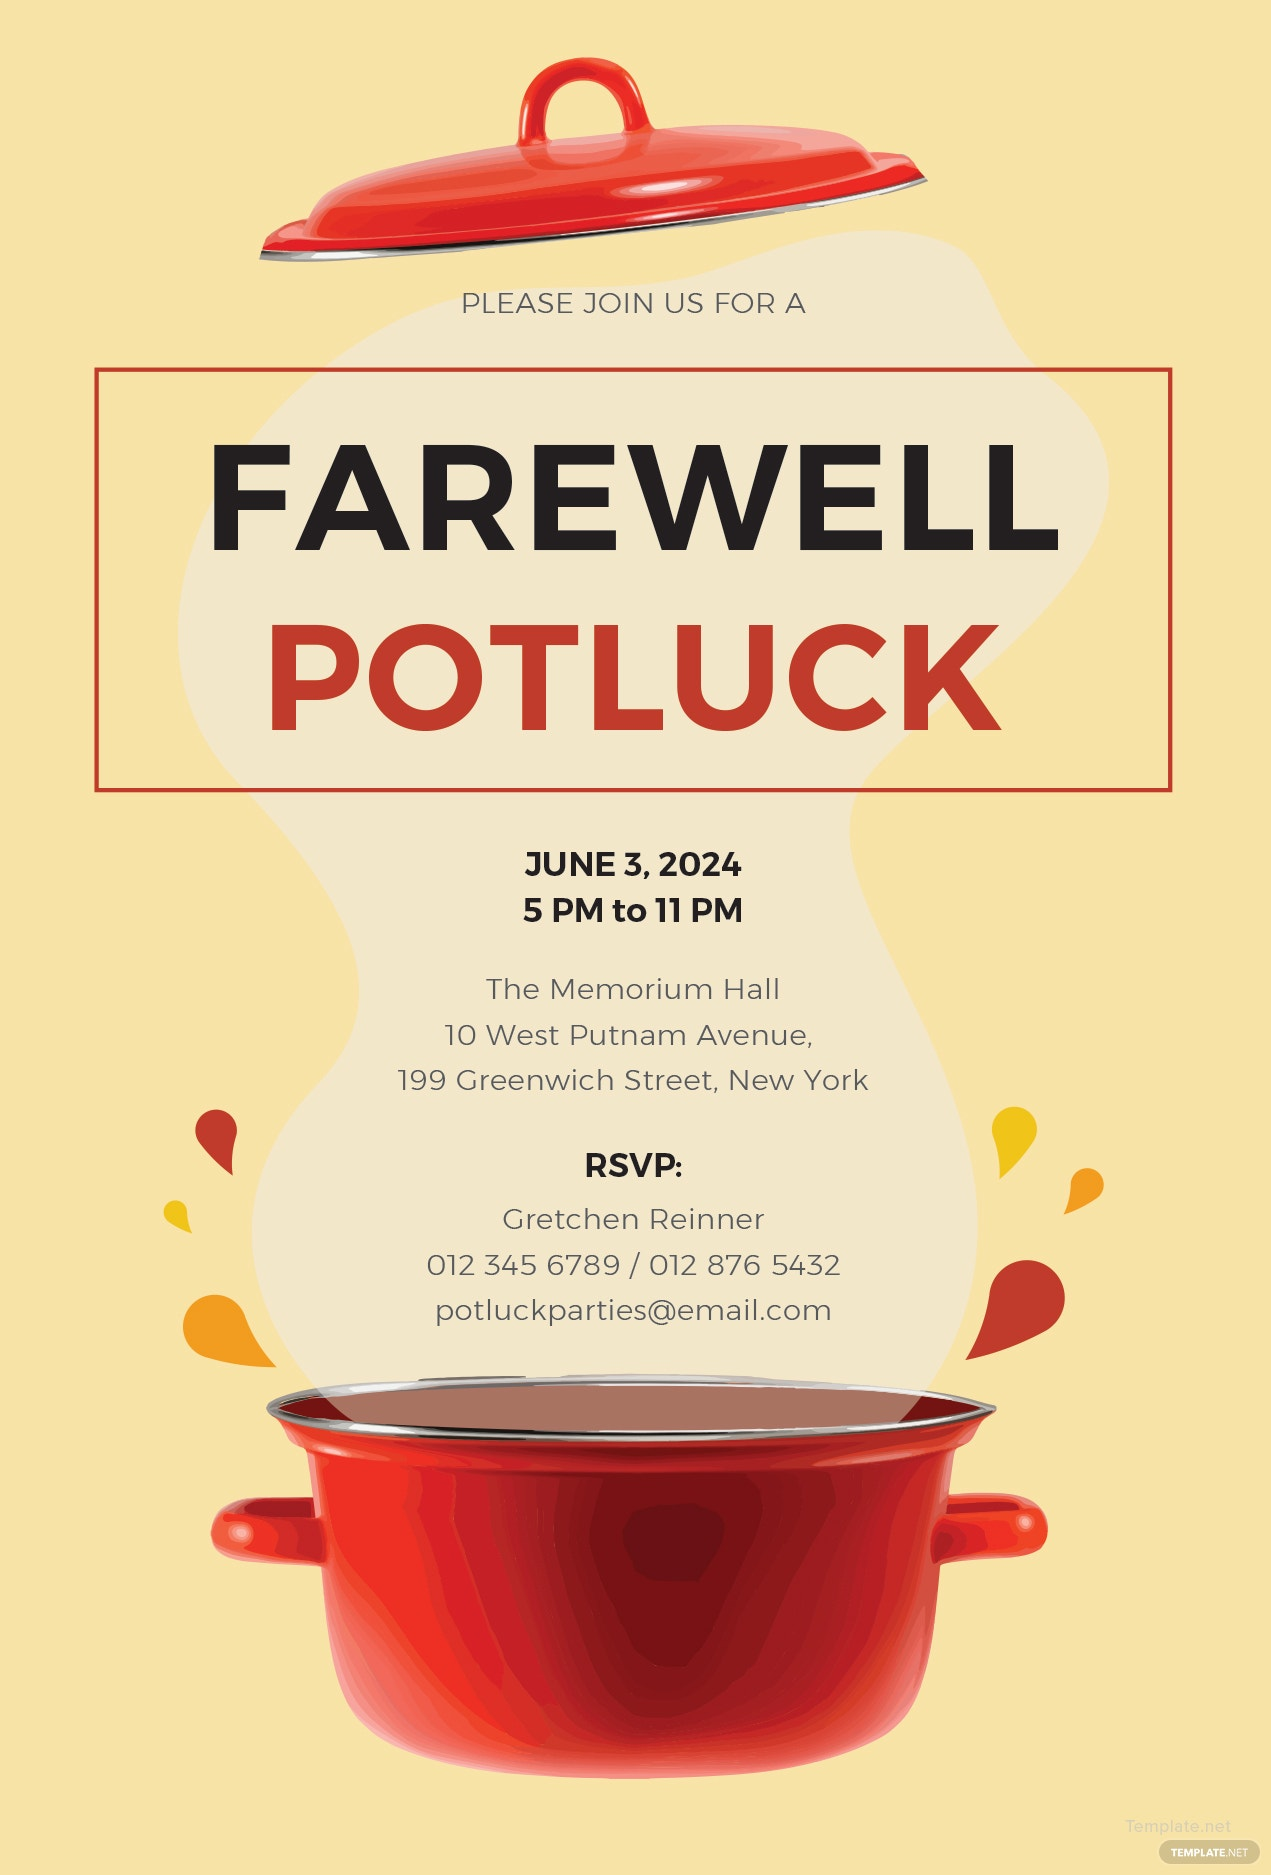 free farewell potluck invitation template in ms word